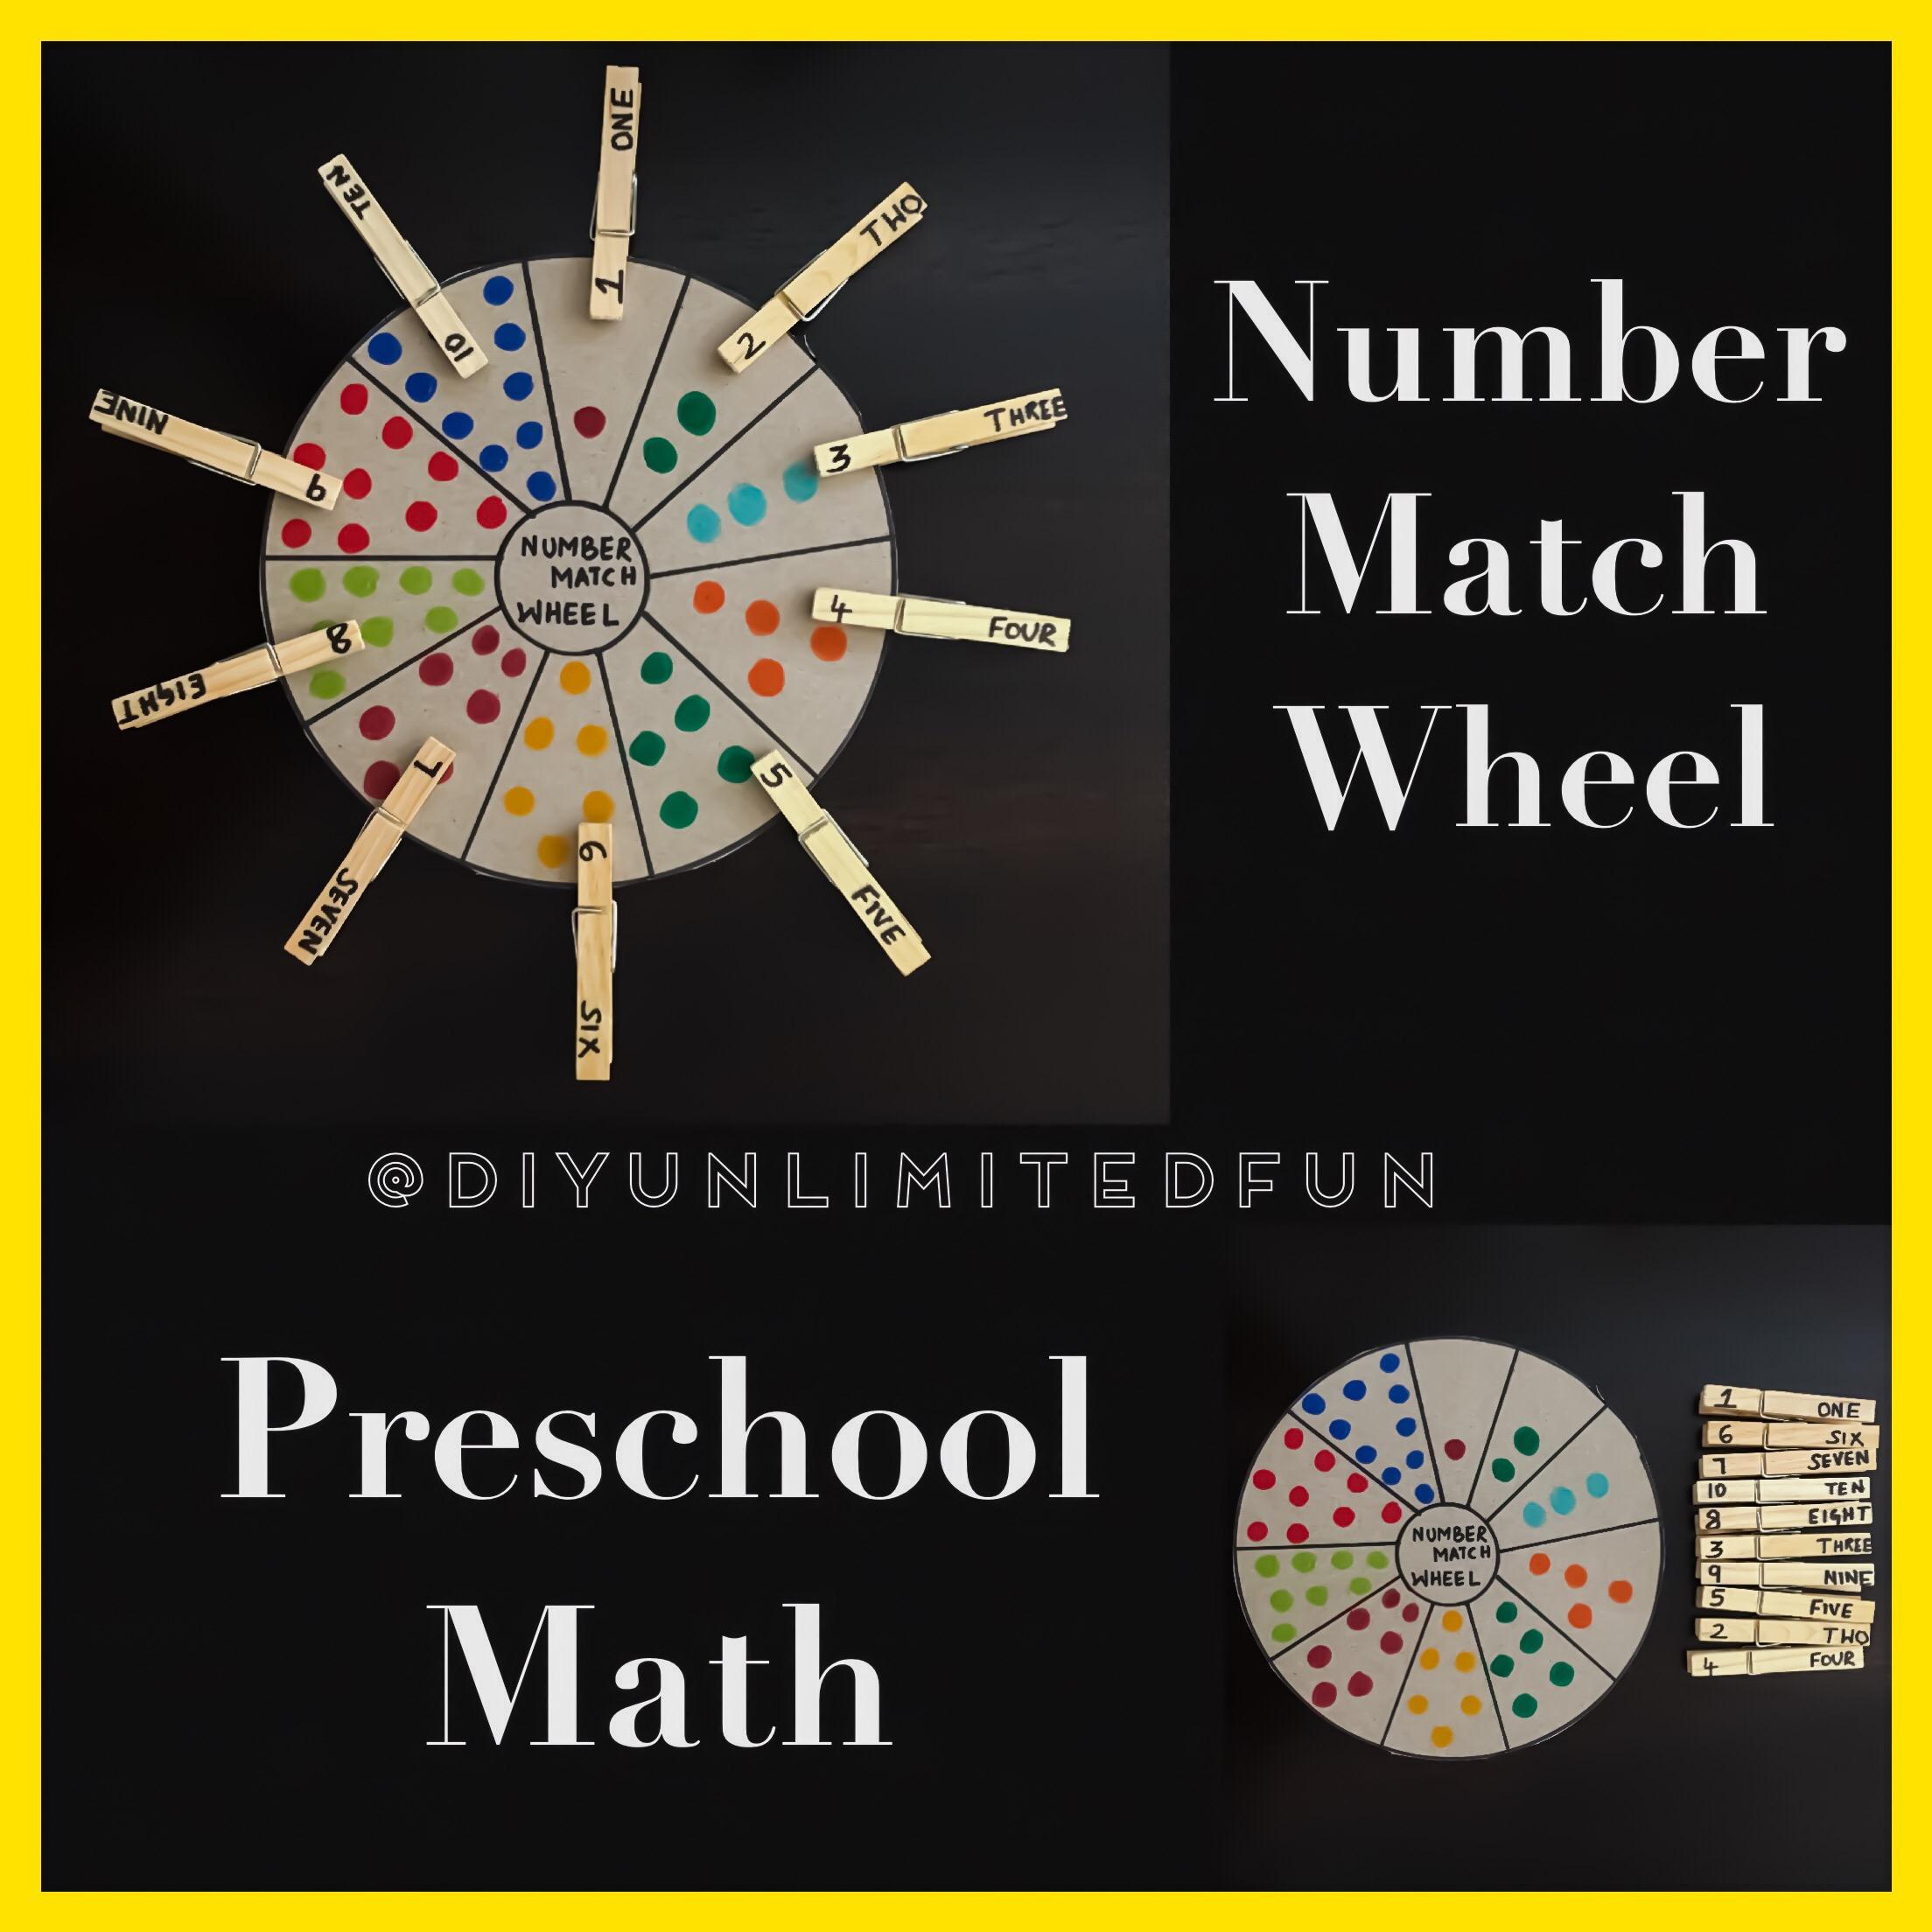 Number Match Wheel Preschool Math Simple Diys Kids Activities